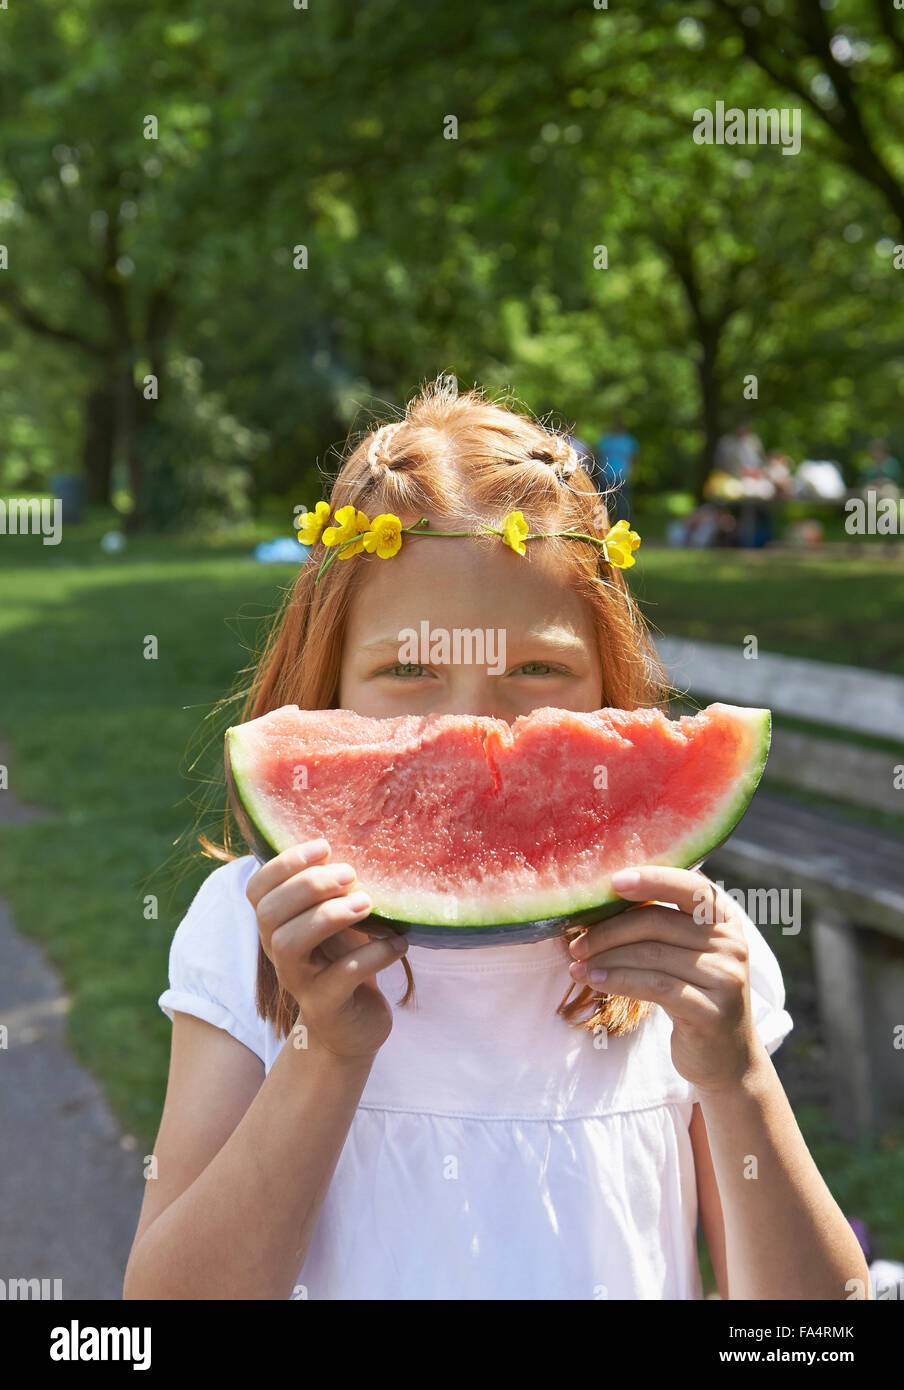 Portrait of a girl enjoying slice of watermelon at picnic, Munich, Bavaria, Germany - Stock Image